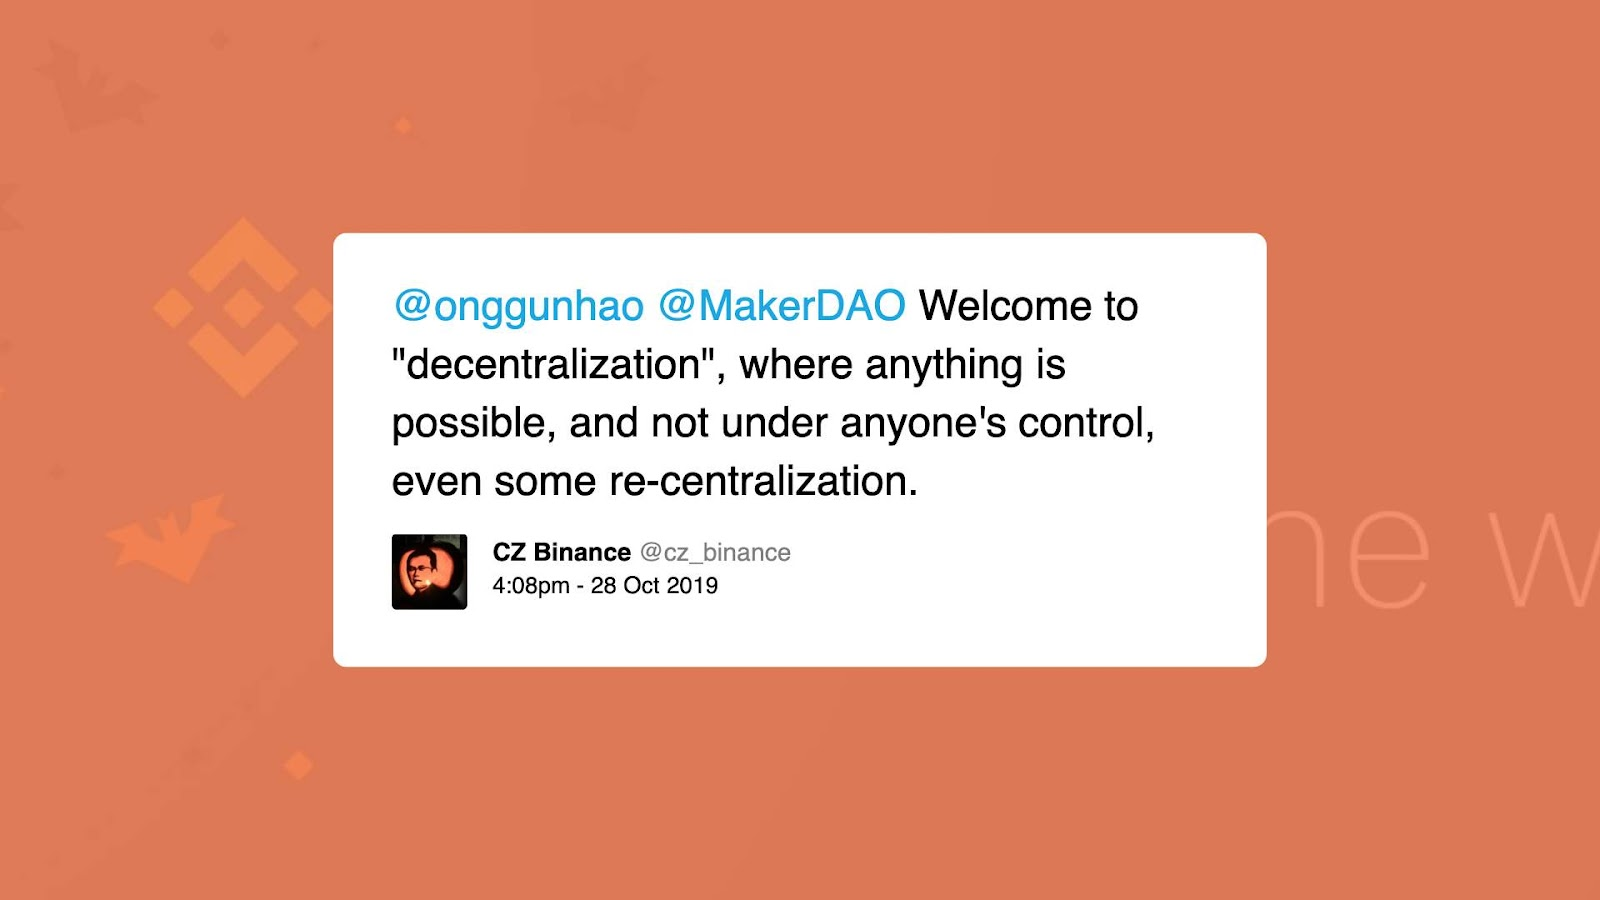 Binance CEO Tweet